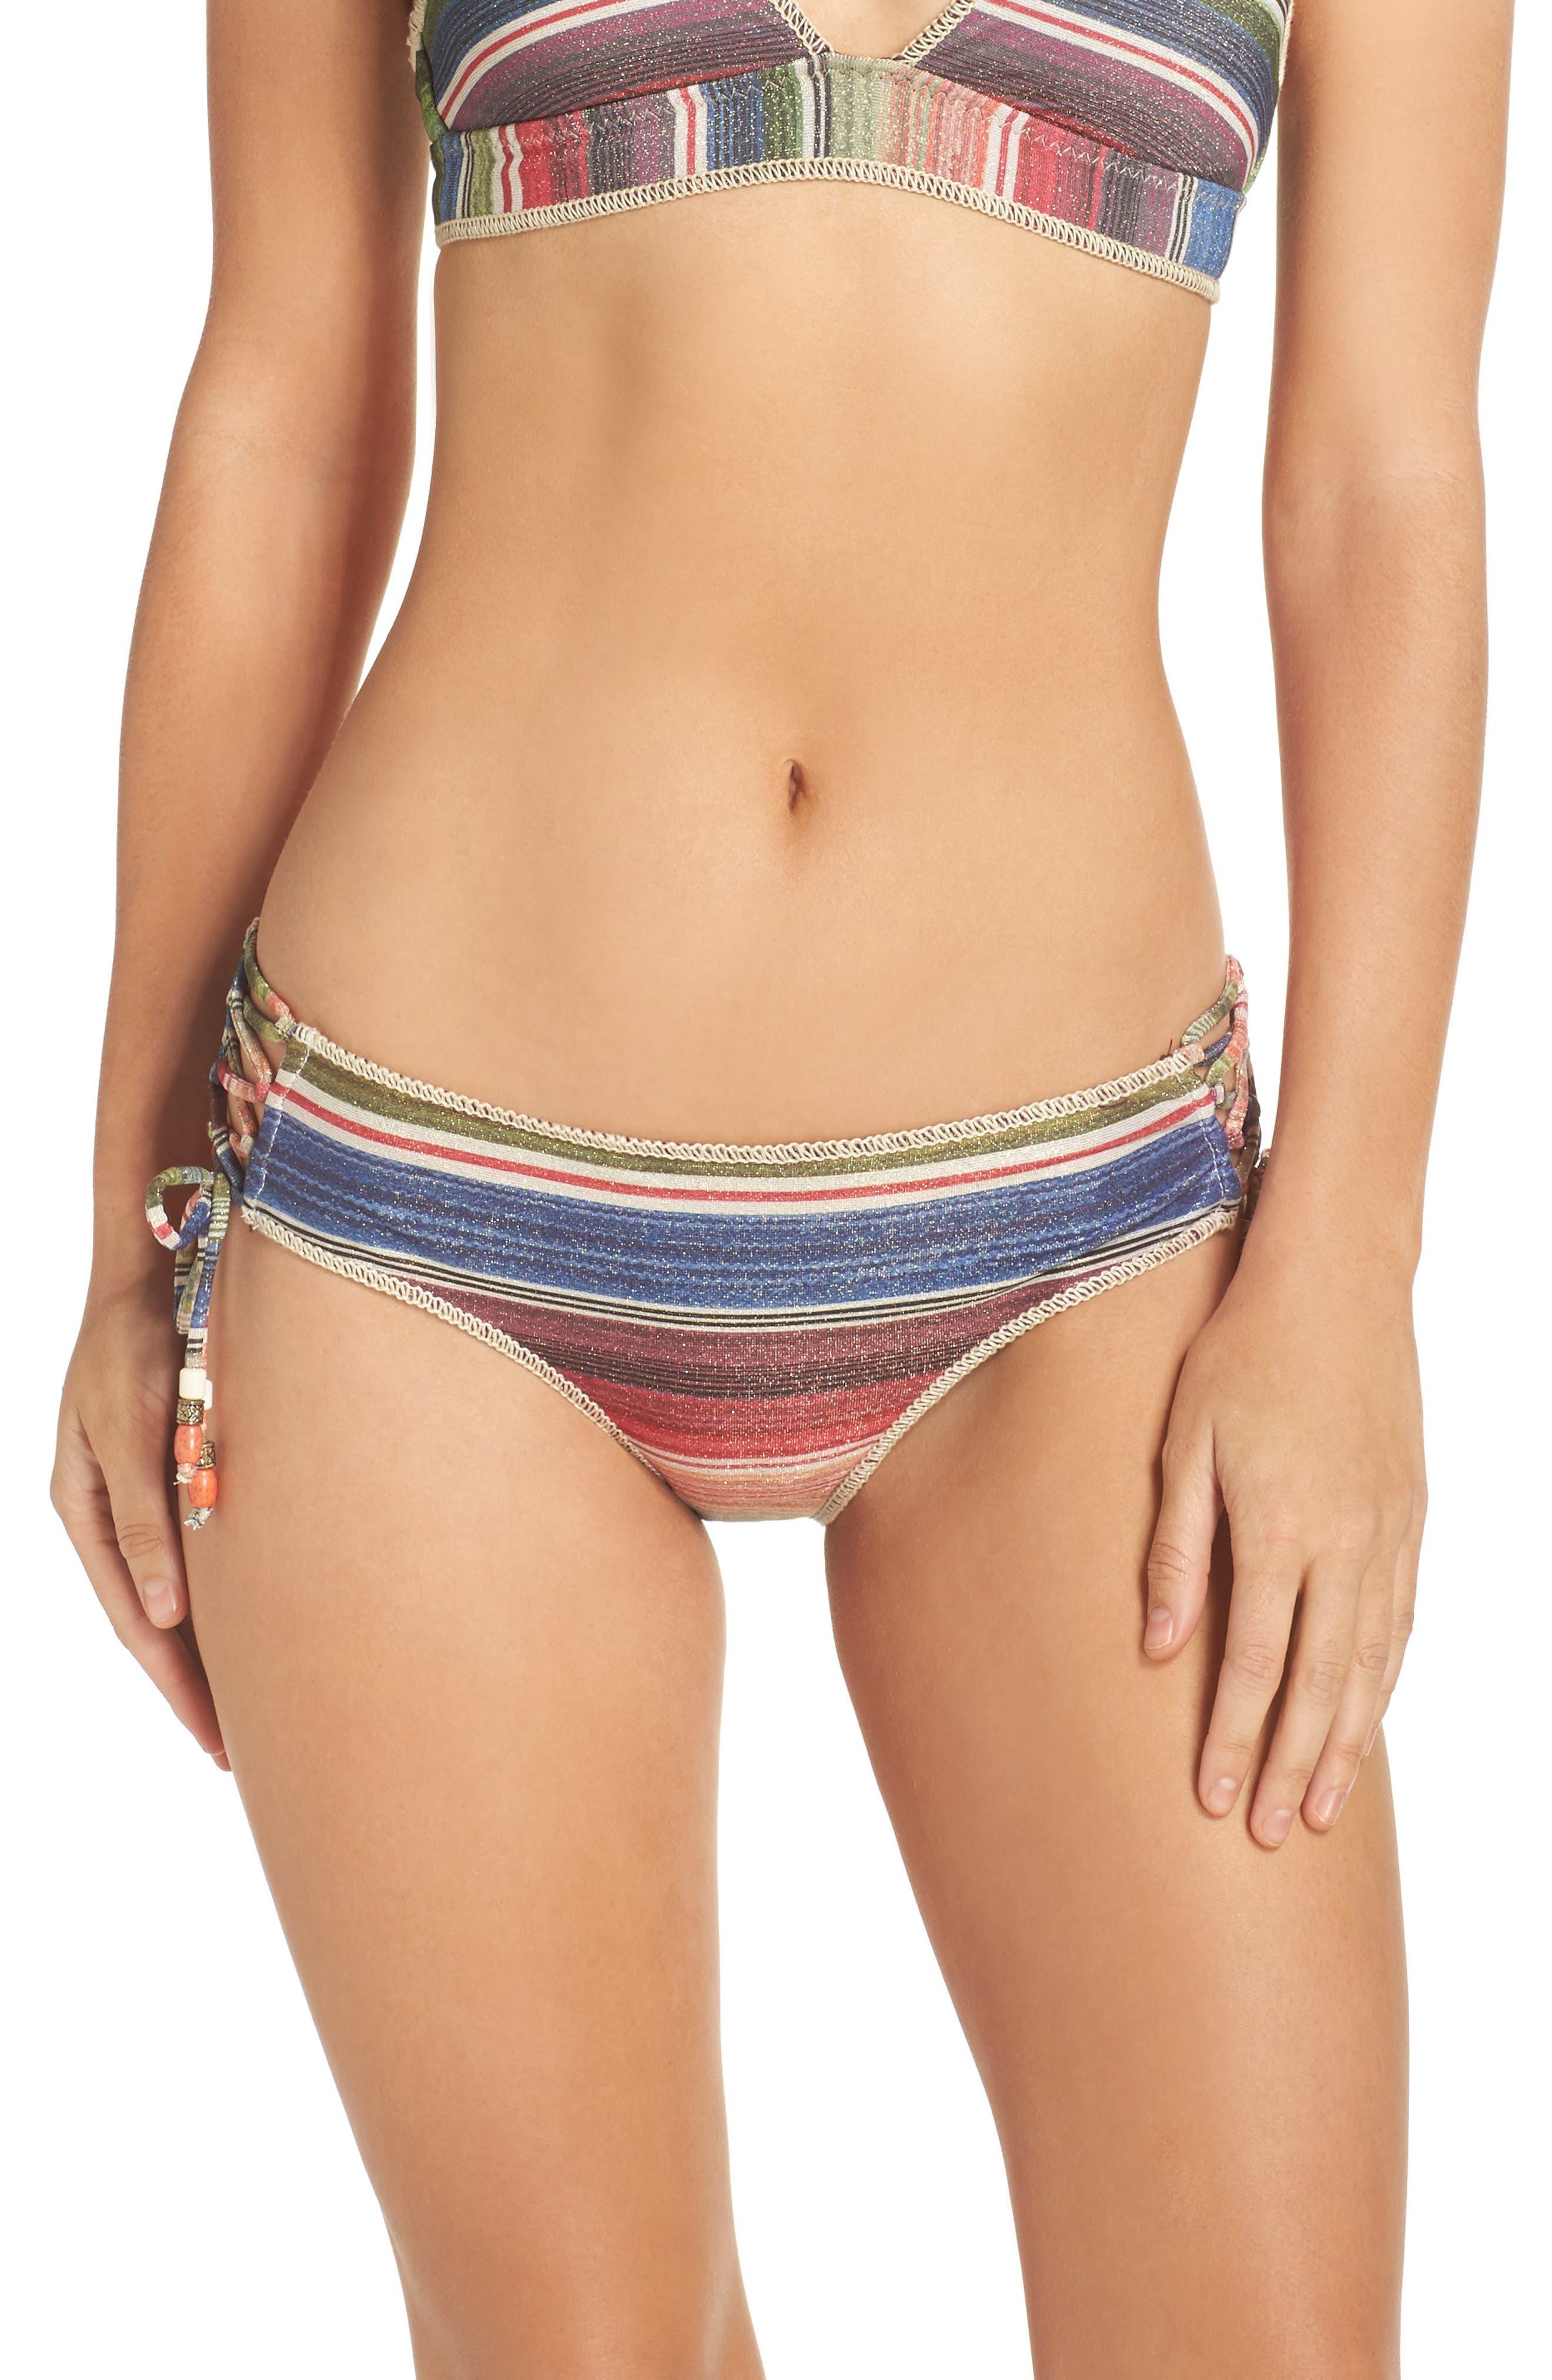 West Village Hipster Bikini Bottoms,                         Main,                         color, Purple Multi